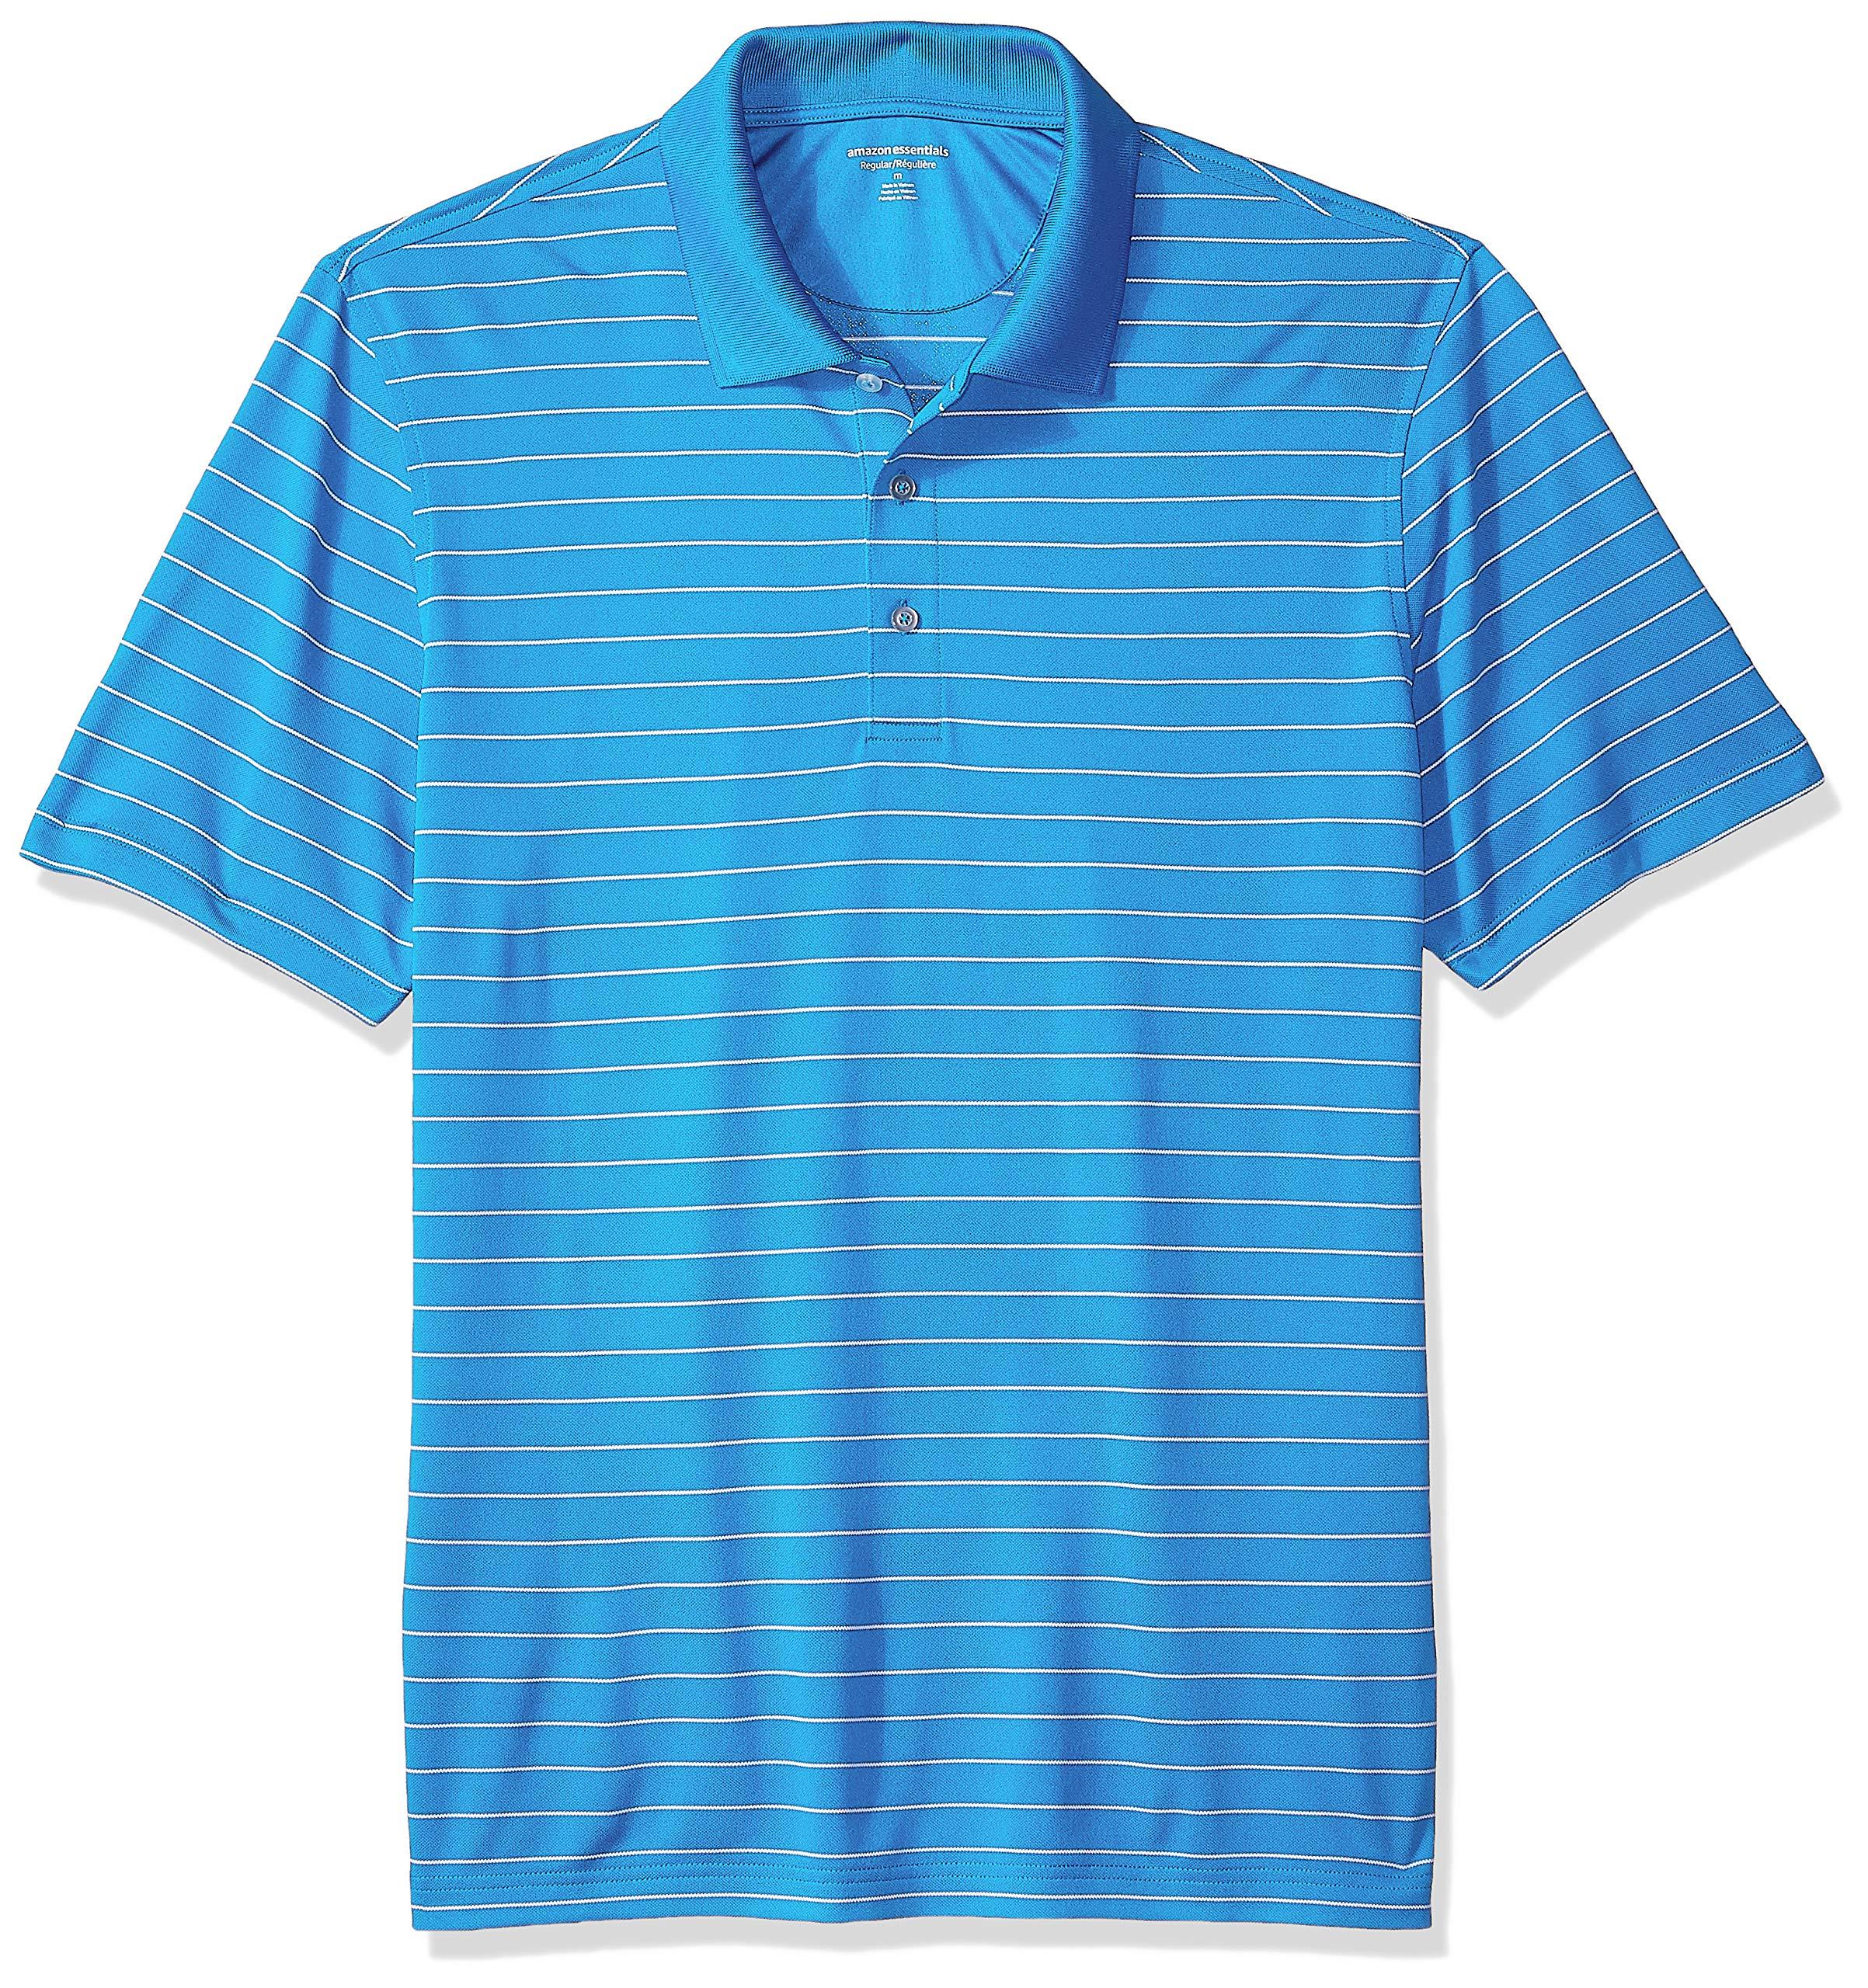 Amazon Essentials Men's Regular-Fit Quick-Dry Golf Polo Shirt, Electric Blue Stripe, X-Small